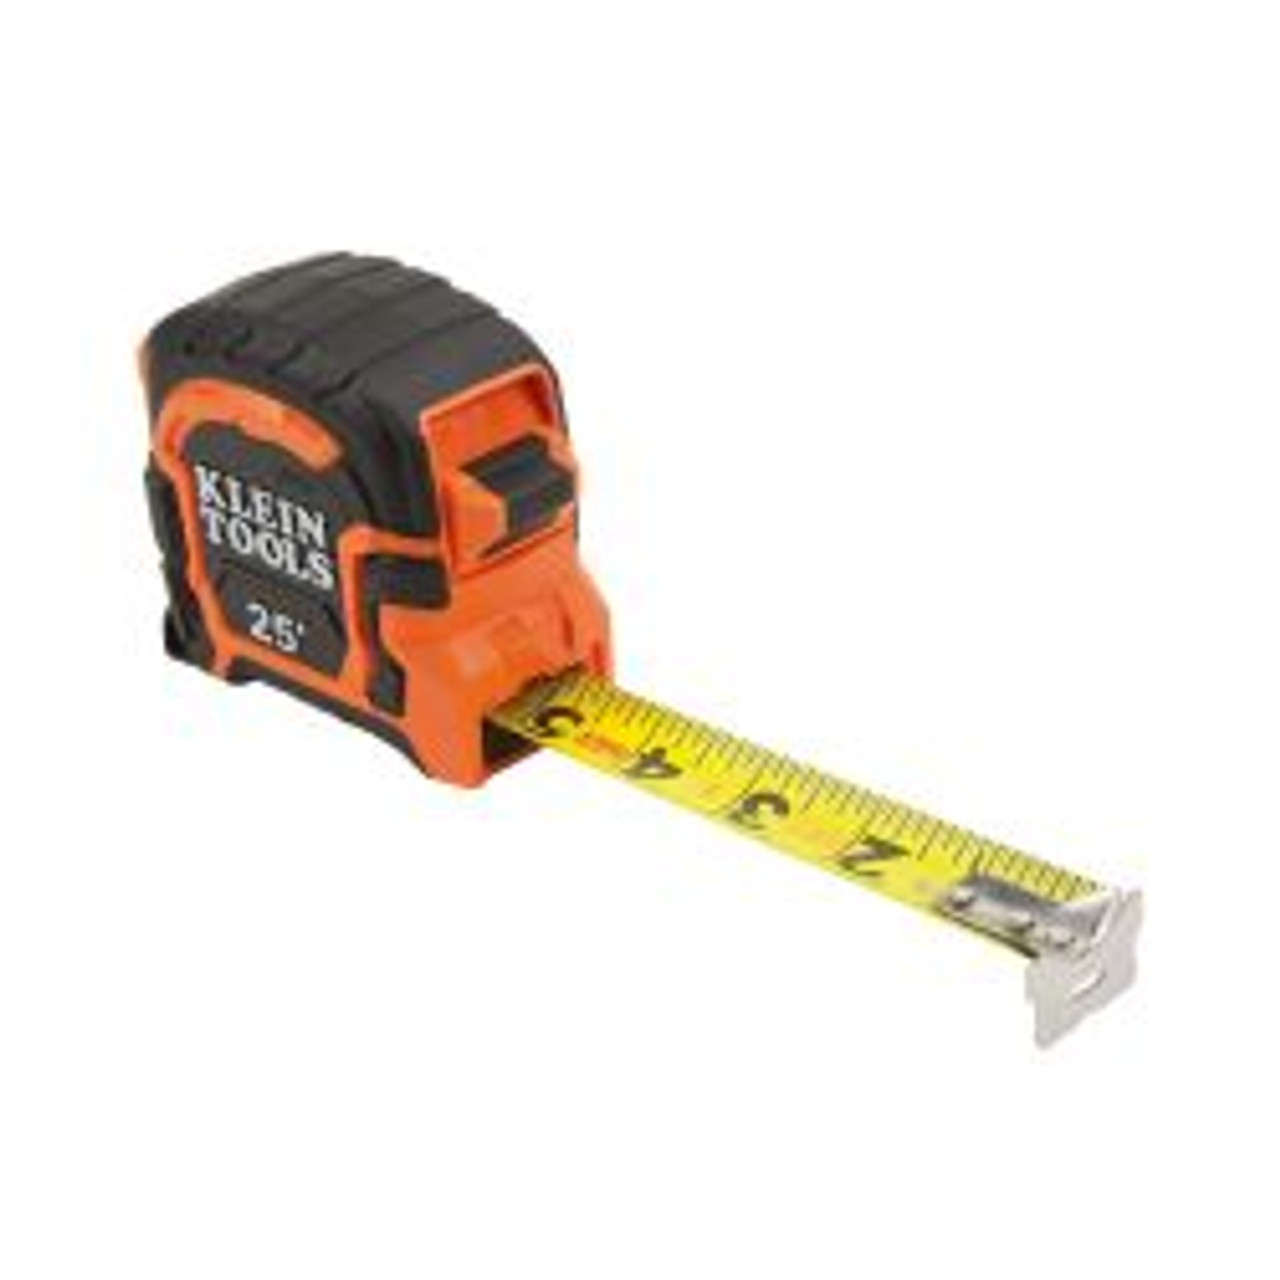 Klein 86125 25ft Single Hook Tape Measure Non Magnetic